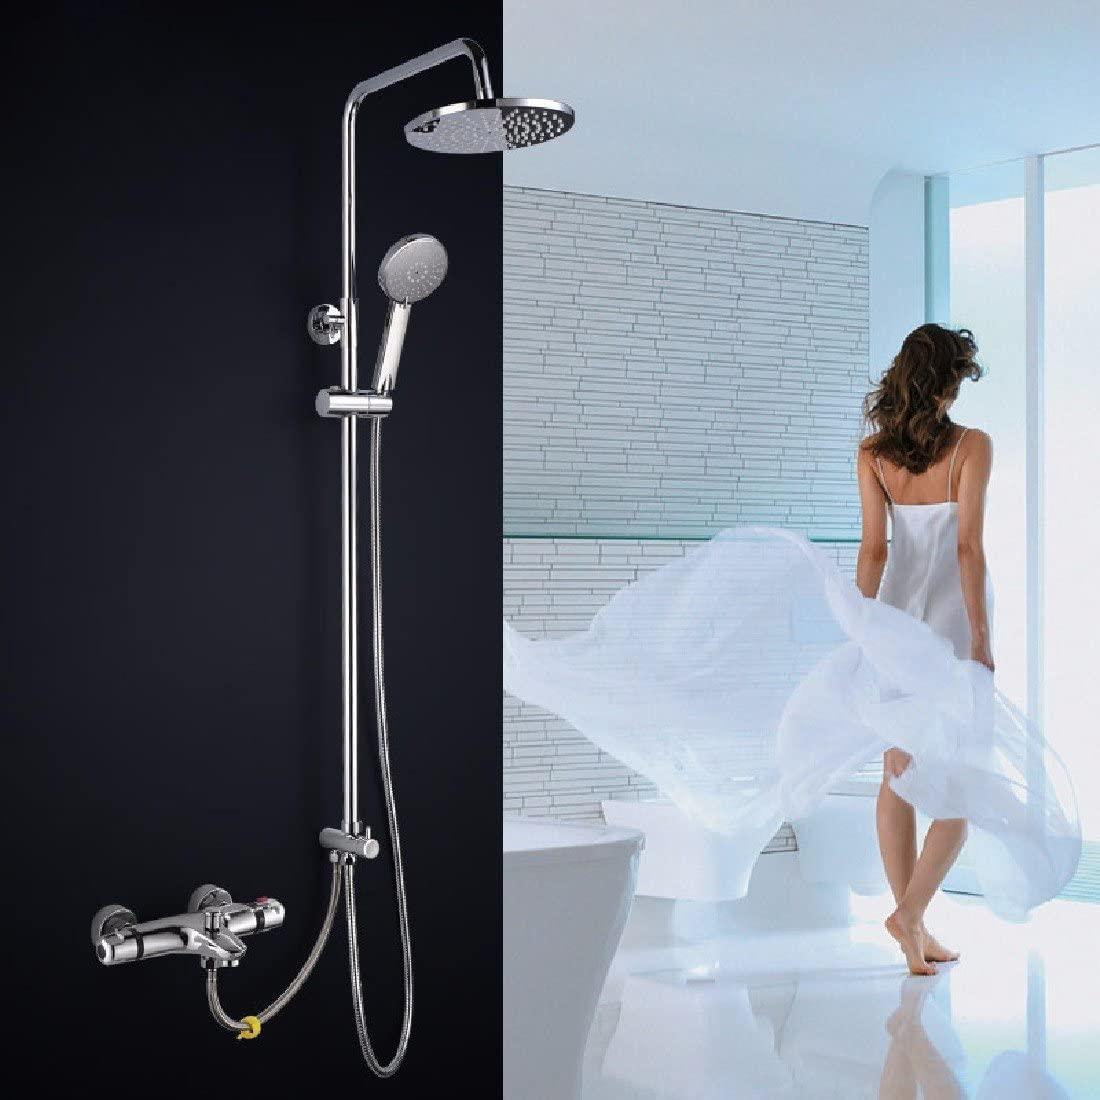 WAWZJ Bathroom Shower Set Creative Split Copper Bathtub Constant Temperature Shower Shower Set Air Pressurized Shower Set,B